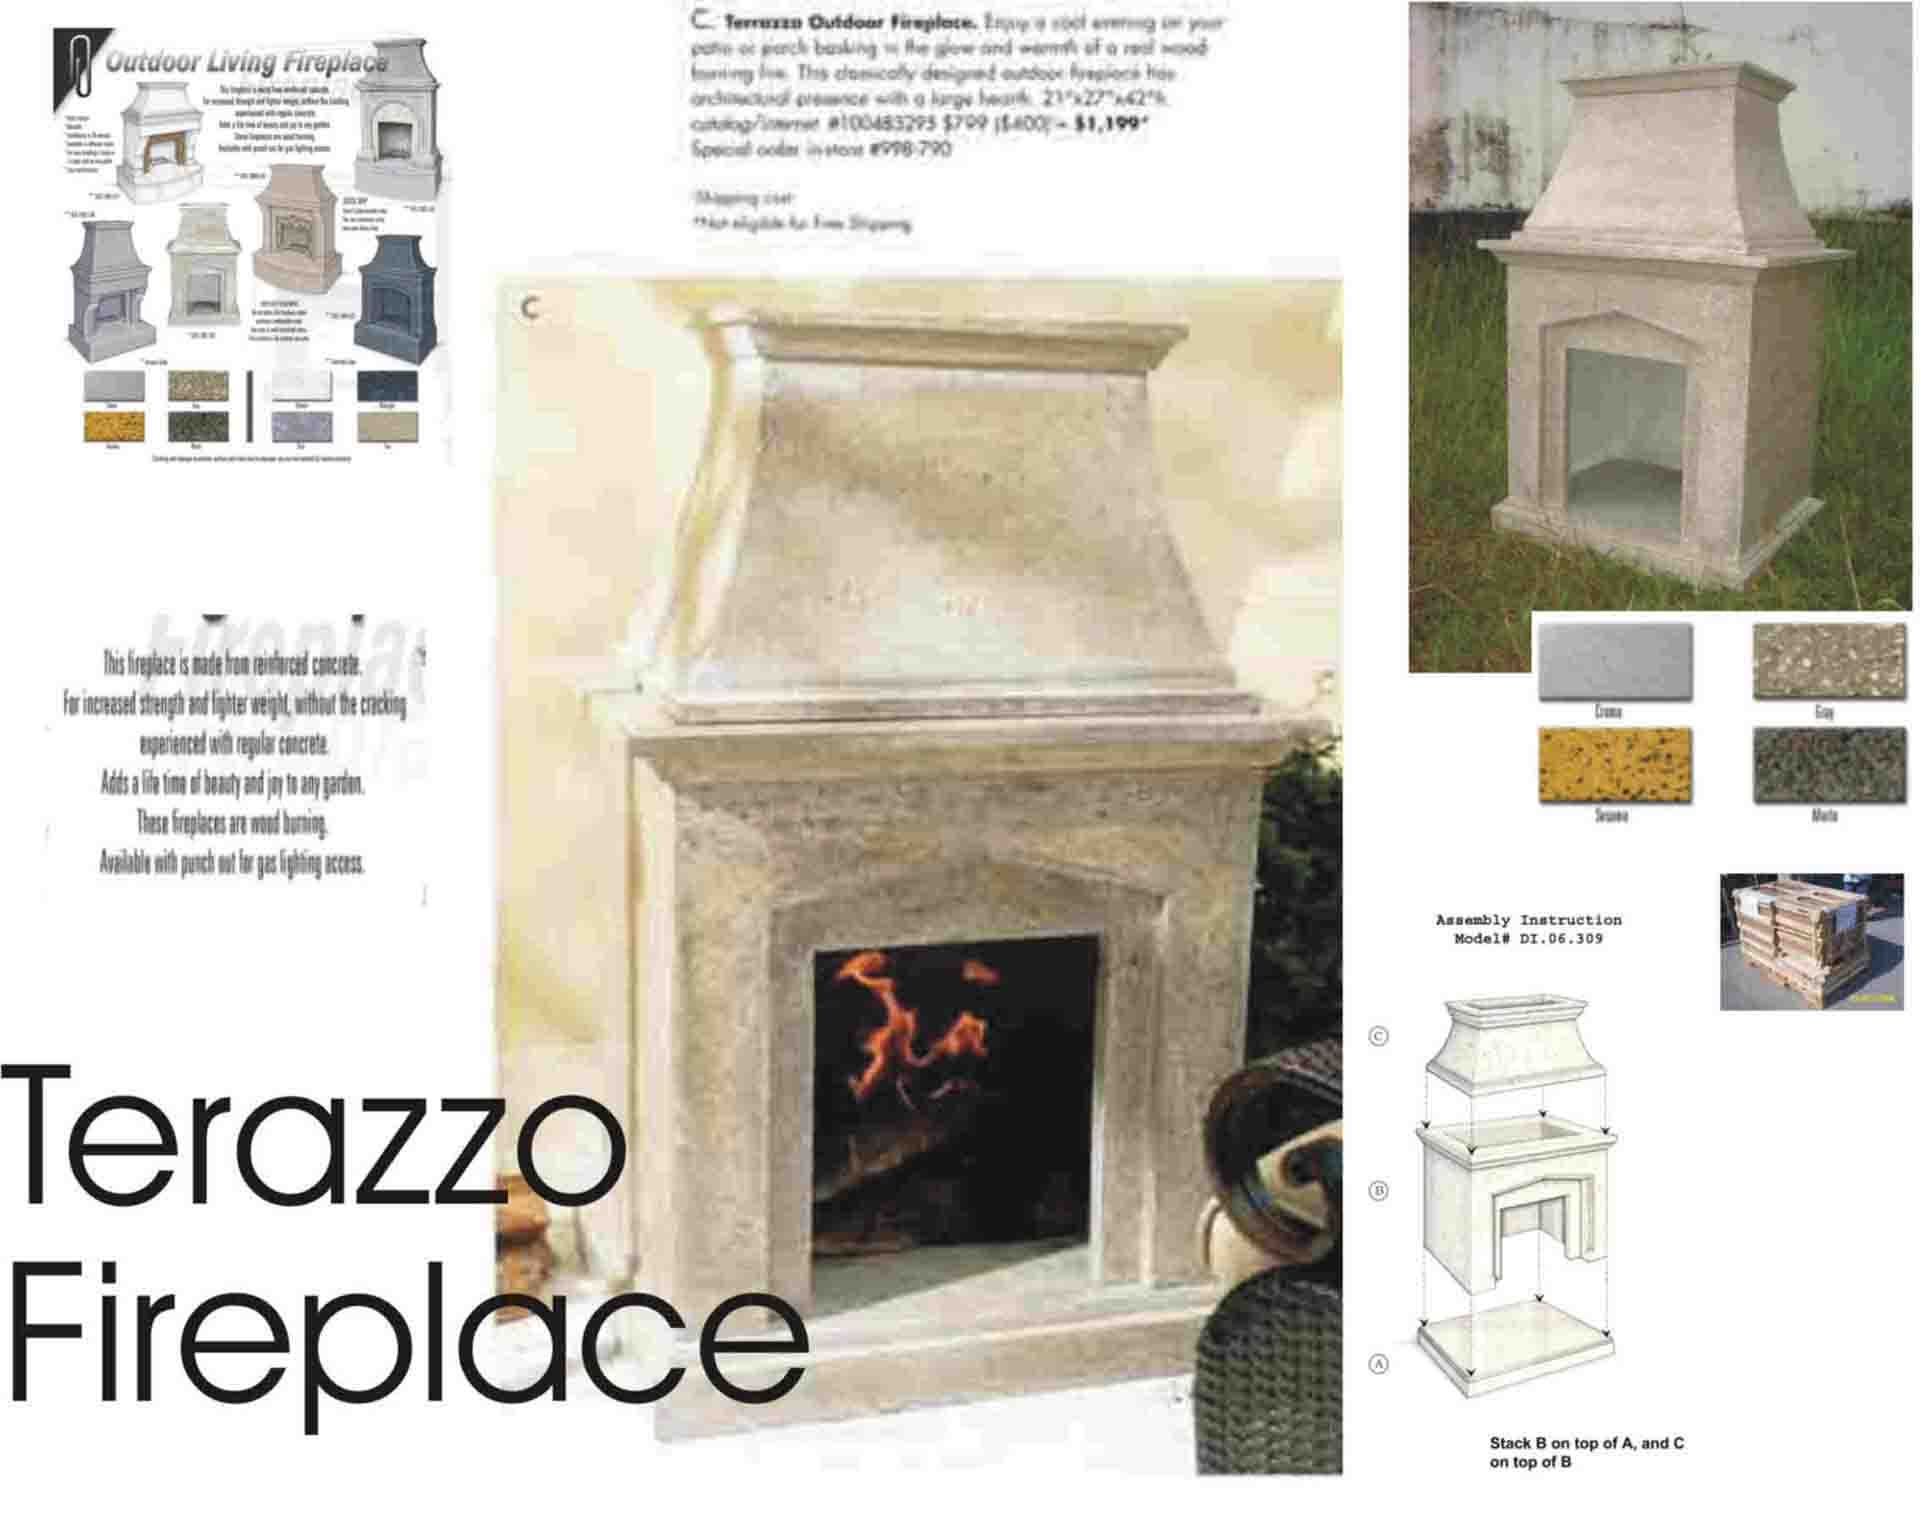 Terazzo Fireplace (Terazzo камин)